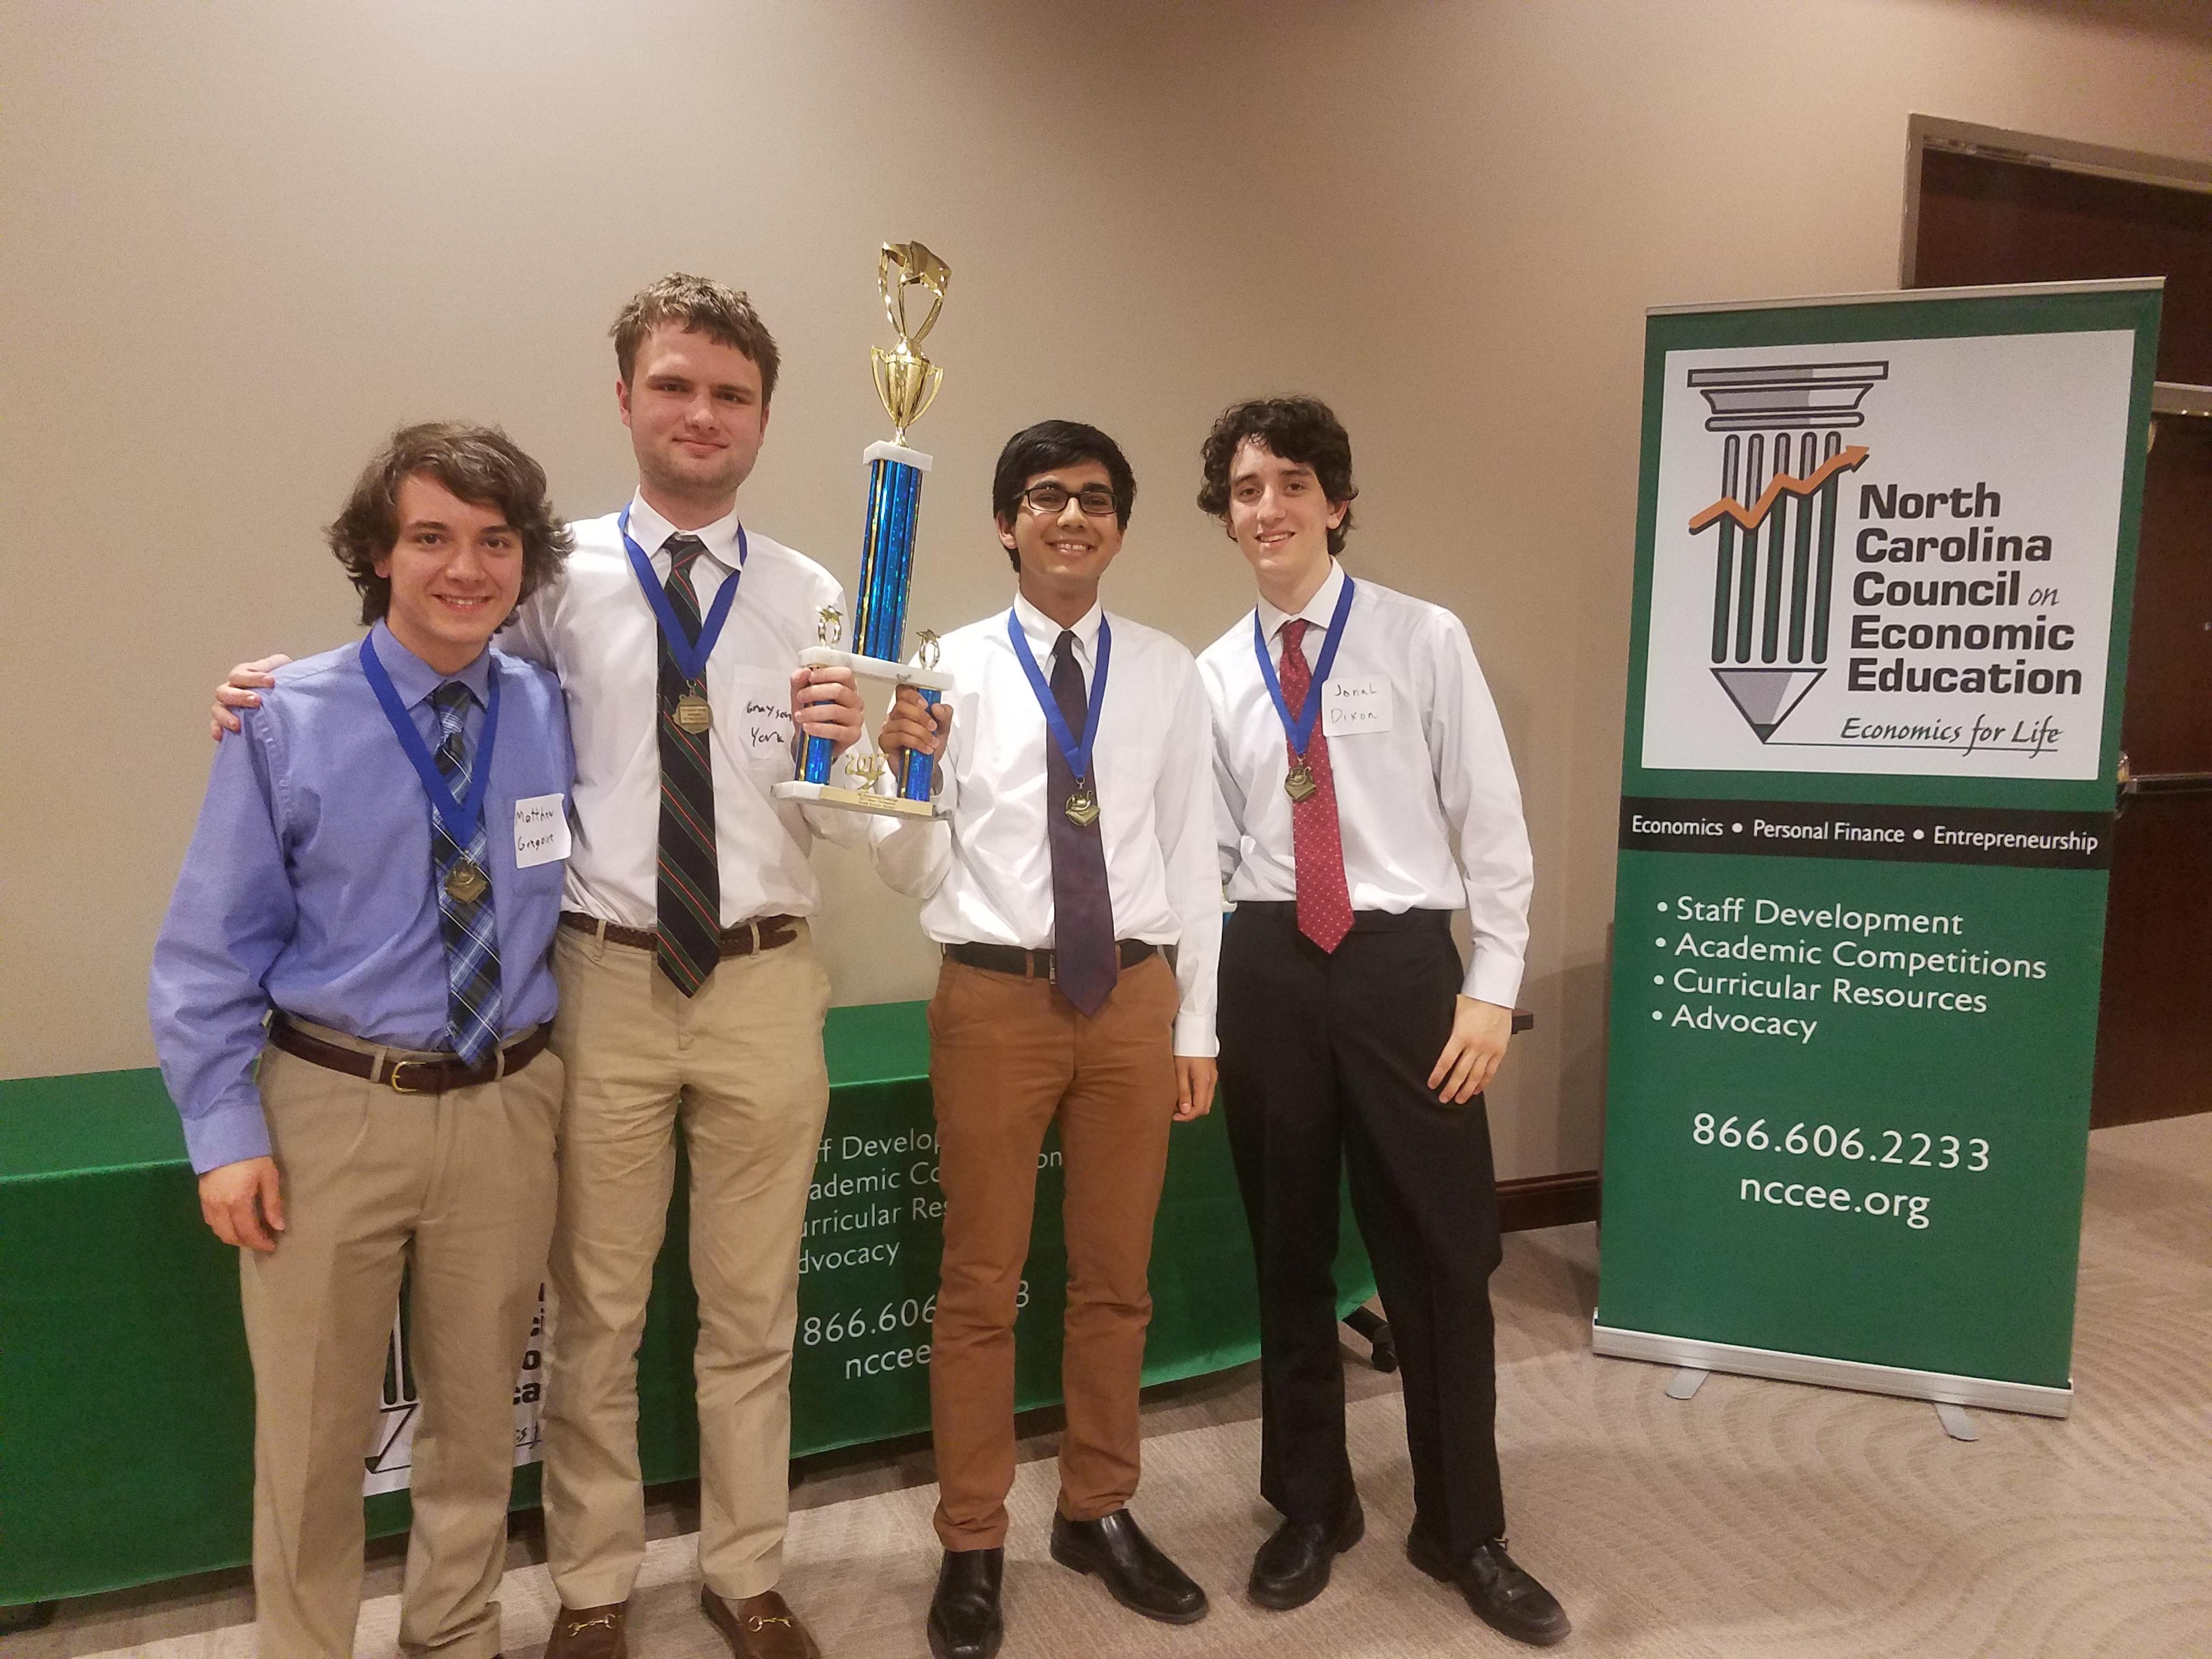 North Carolina School of Science and Mathematics- Matthew Gregoire, Grayson Alan York, Nolan Miranda, and Jonah Dixon.